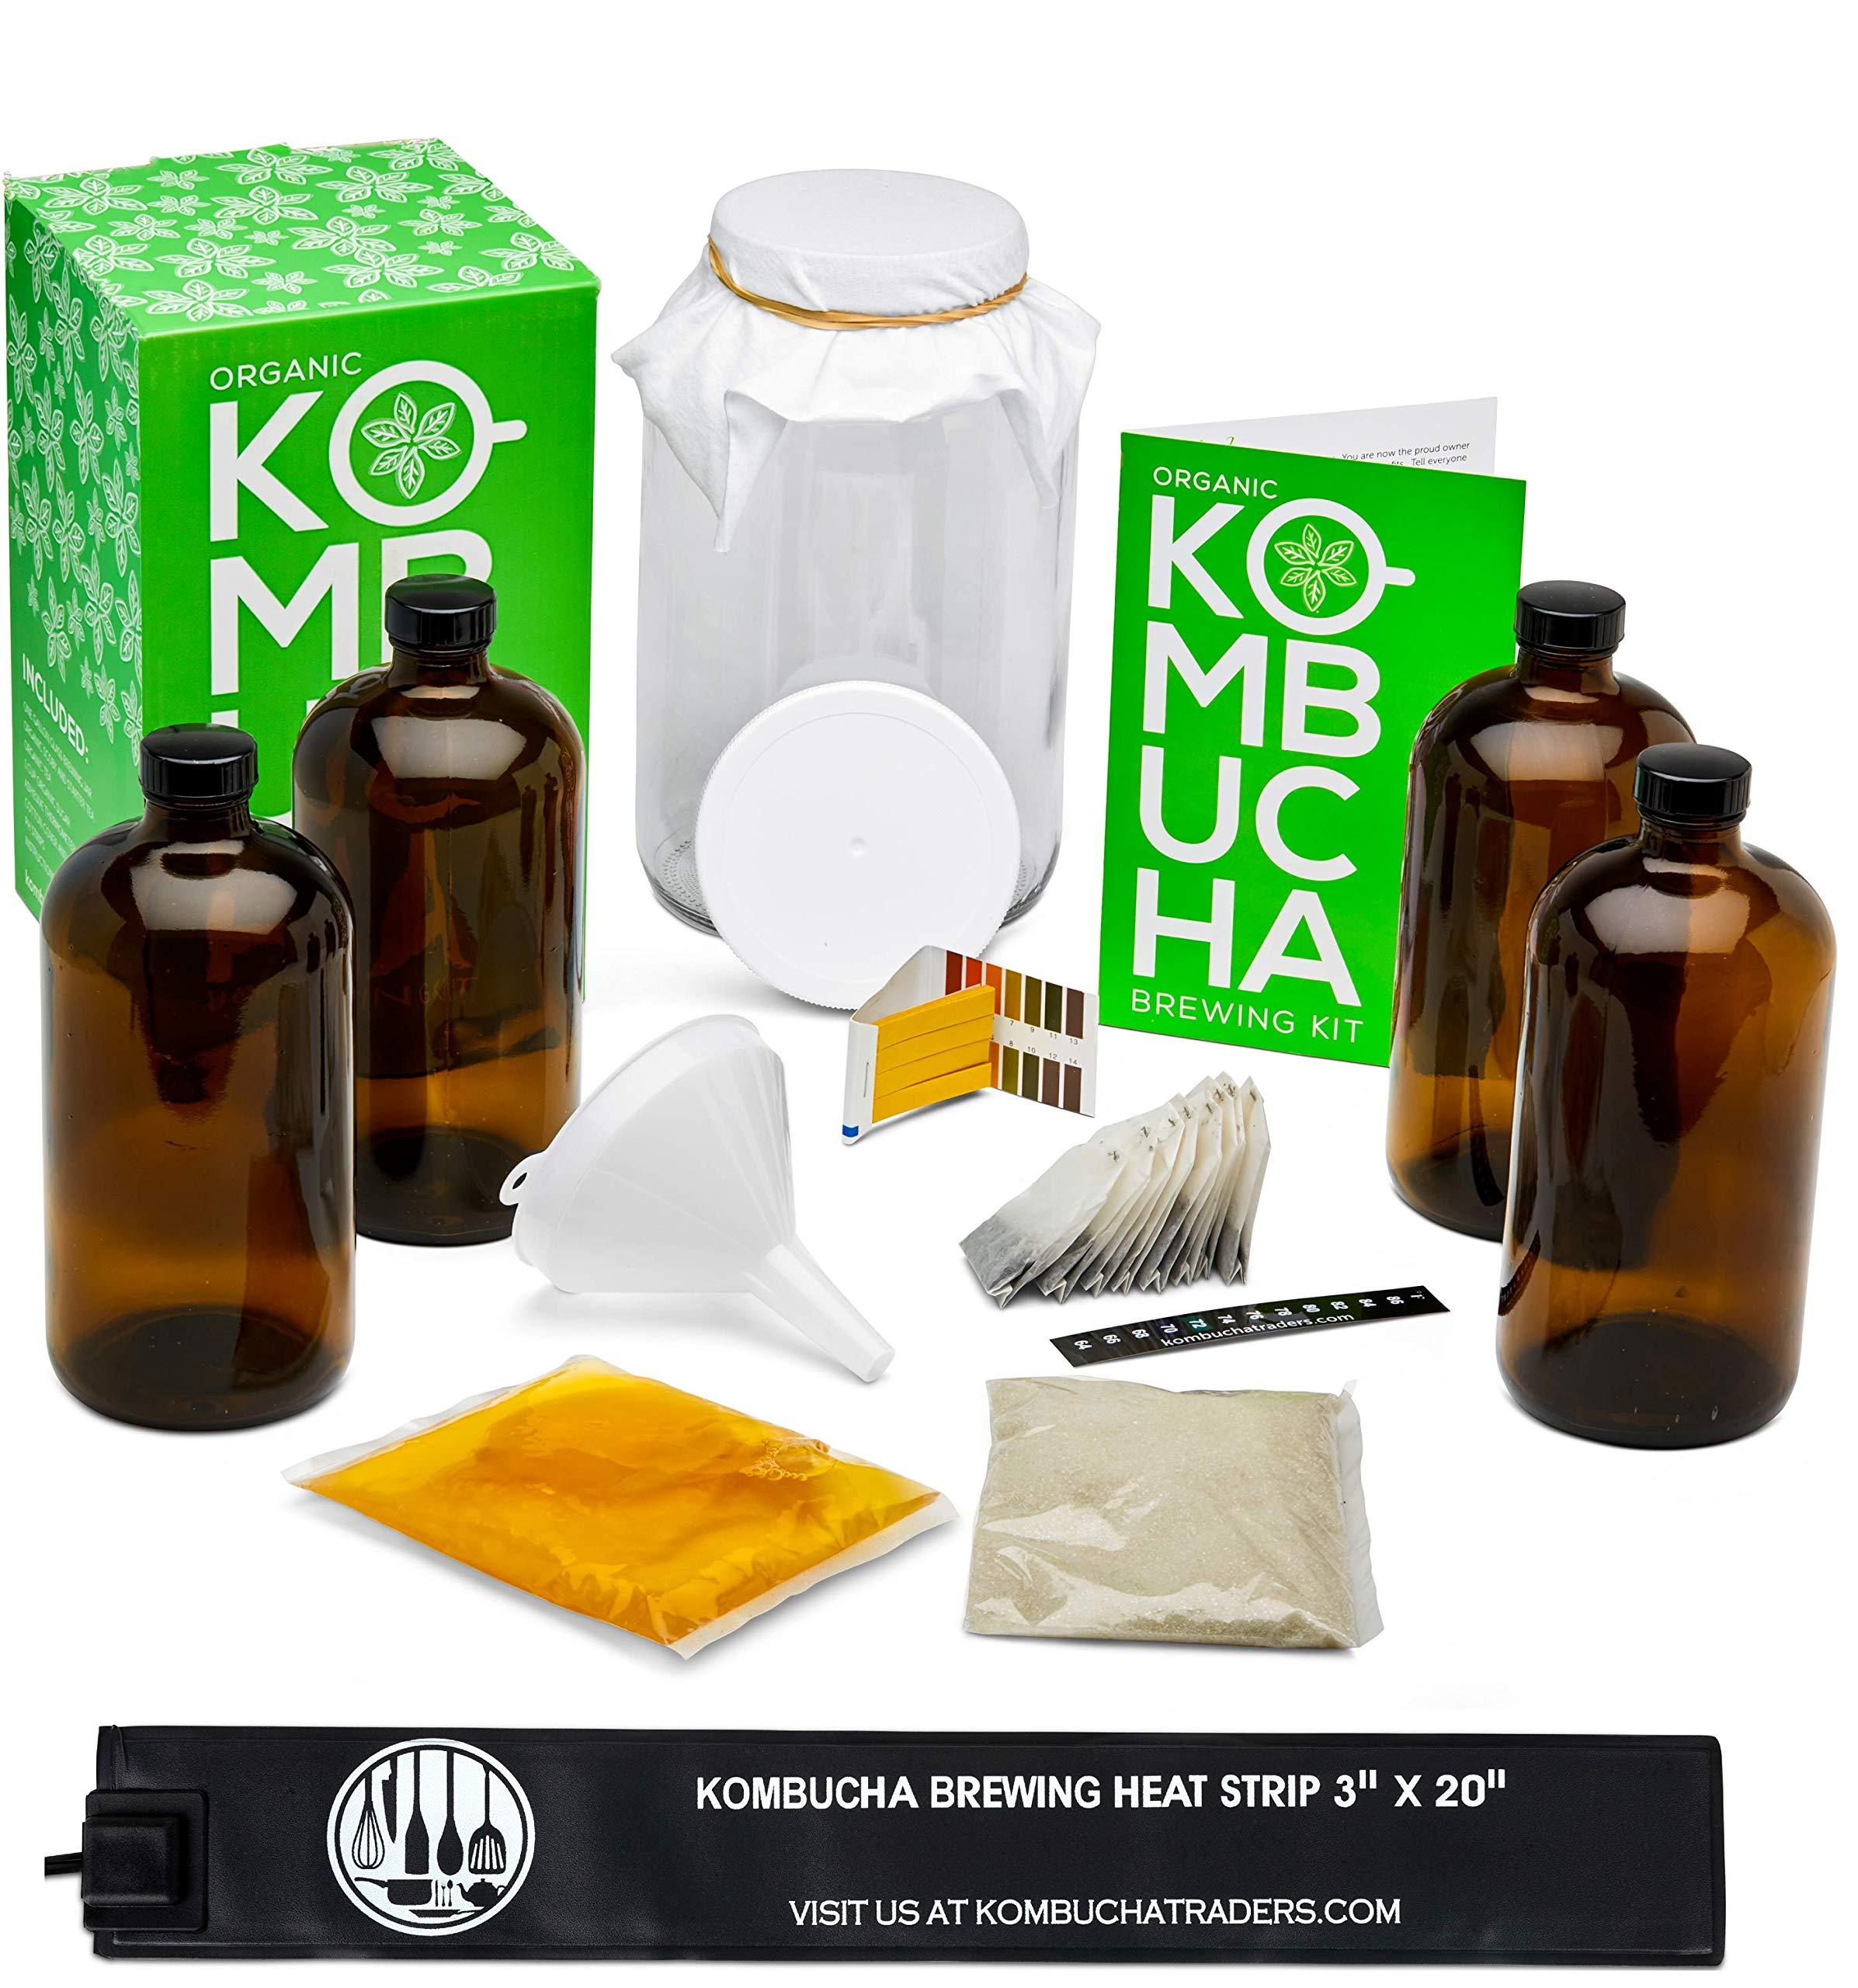 Kitchentoolz Two Phase Kombucha Starter Kit w/Heat Wrap- Kombucha Jar, Kombucha Bottles, Scoby and Basic Ingredients for a Full Kombucha Experience (Amber Bottles)